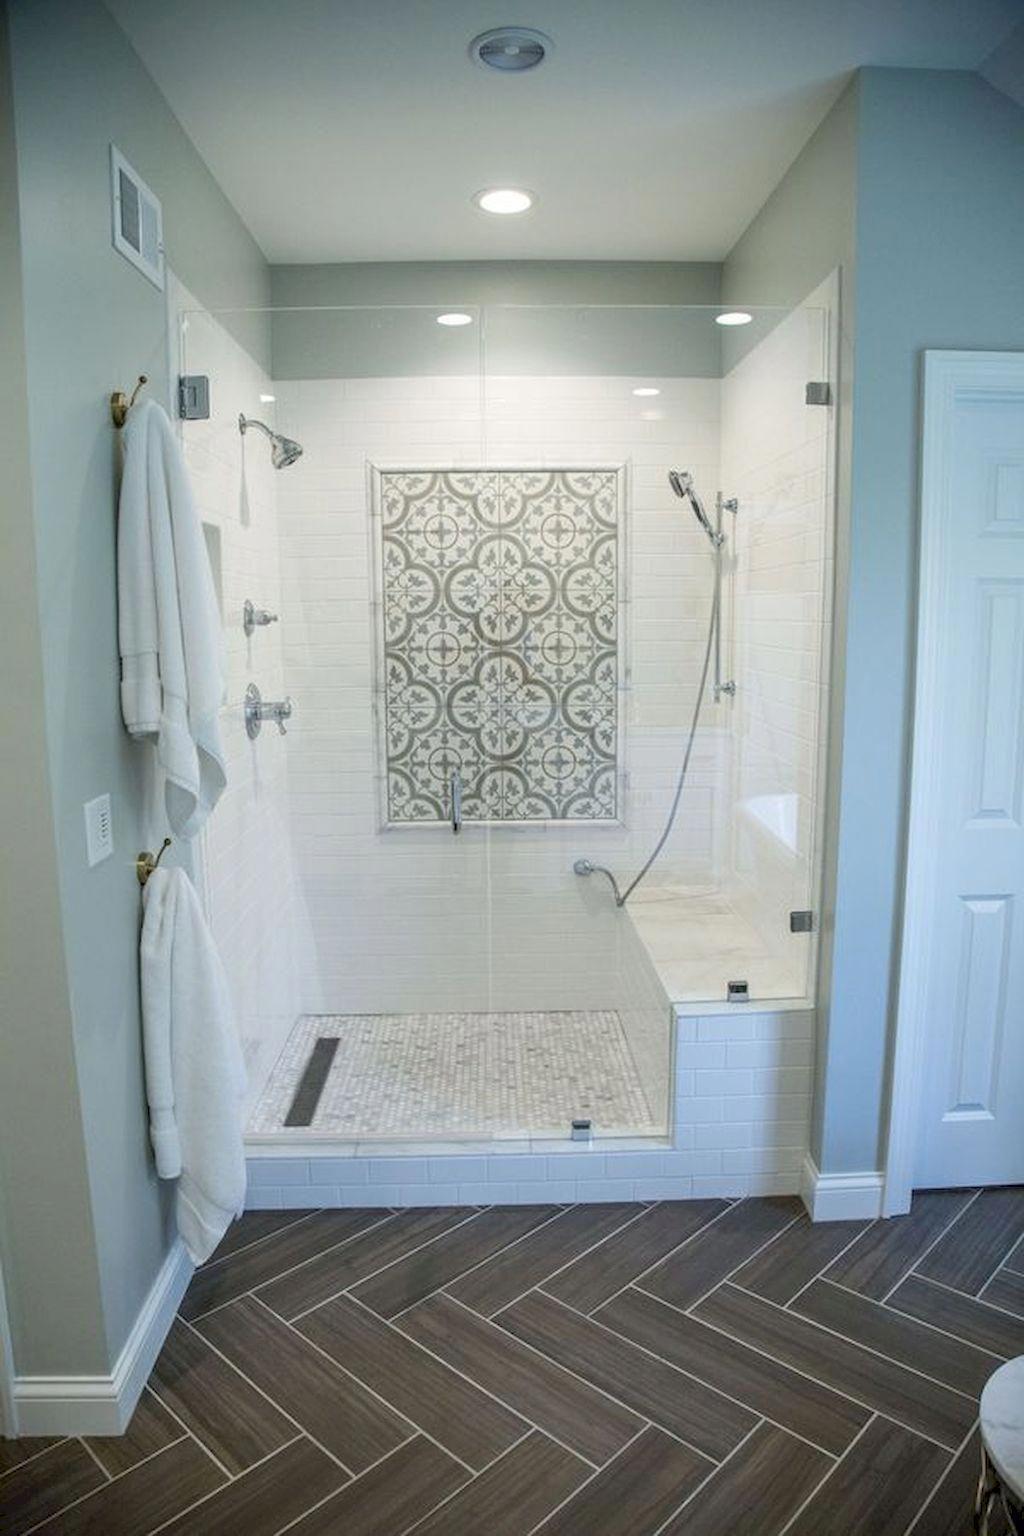 Nice 80 Stunning Tile Shower Designs Ideas For Bathroom Remodel Https Roomadness Com 2017 11 25 Bathroom Remodel Master Bathrooms Remodel Beautiful Bathrooms